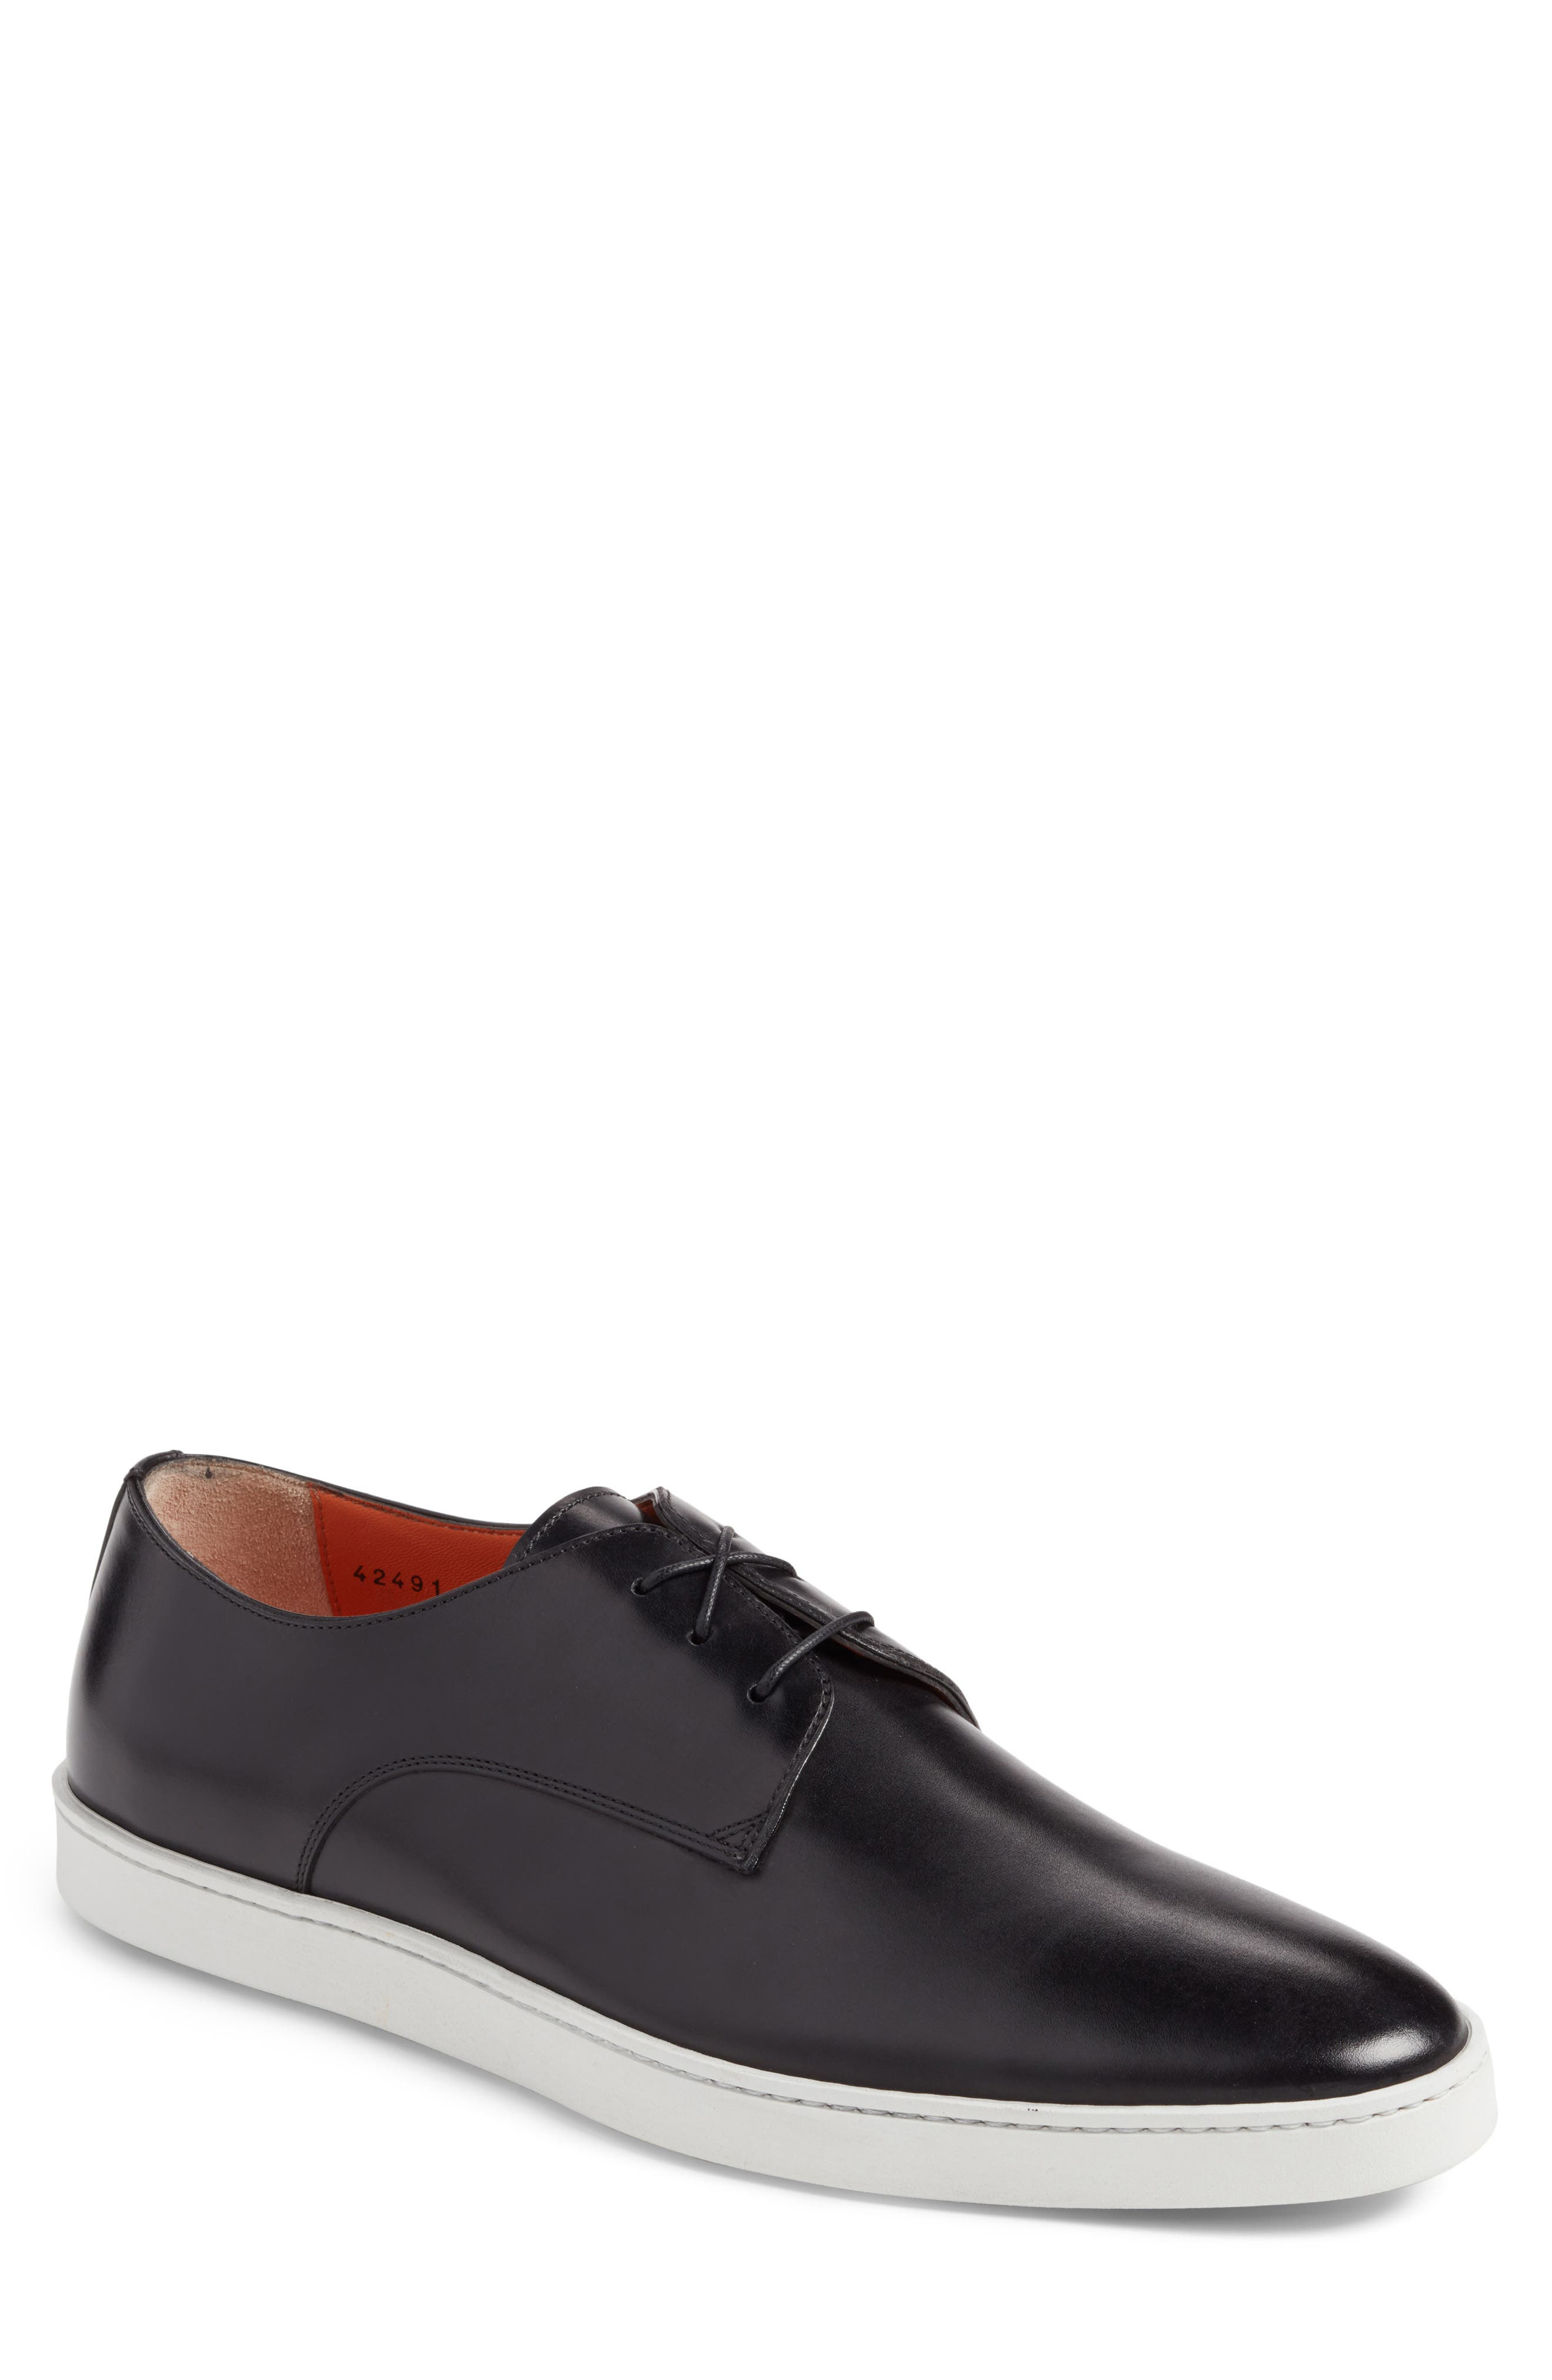 Doyle Sneaker,                             Main thumbnail 1, color,                             BLACK LEATHER